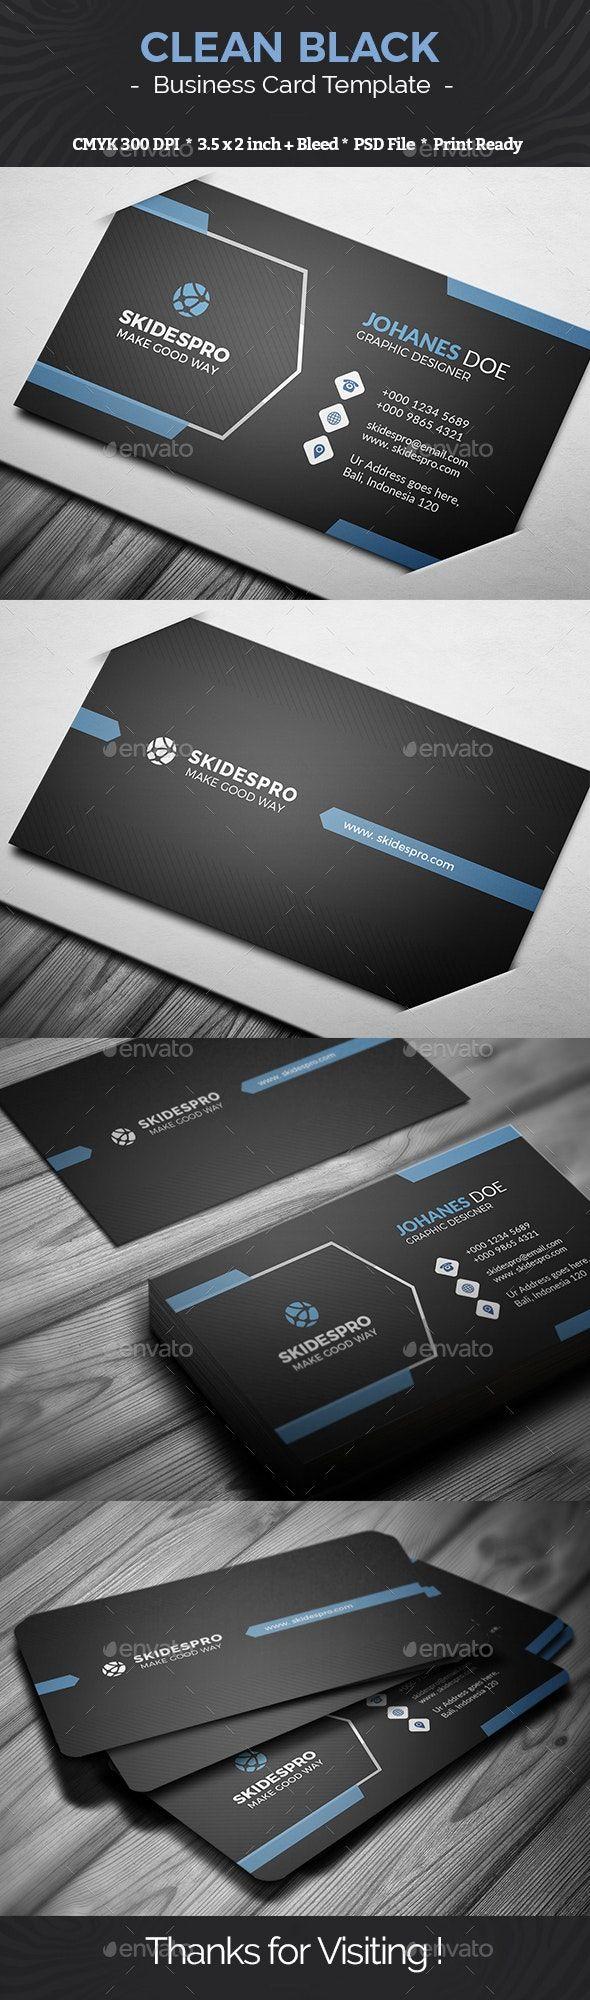 Clean Black Unique Business Cards Business Card Design Creative Business Card Template Design